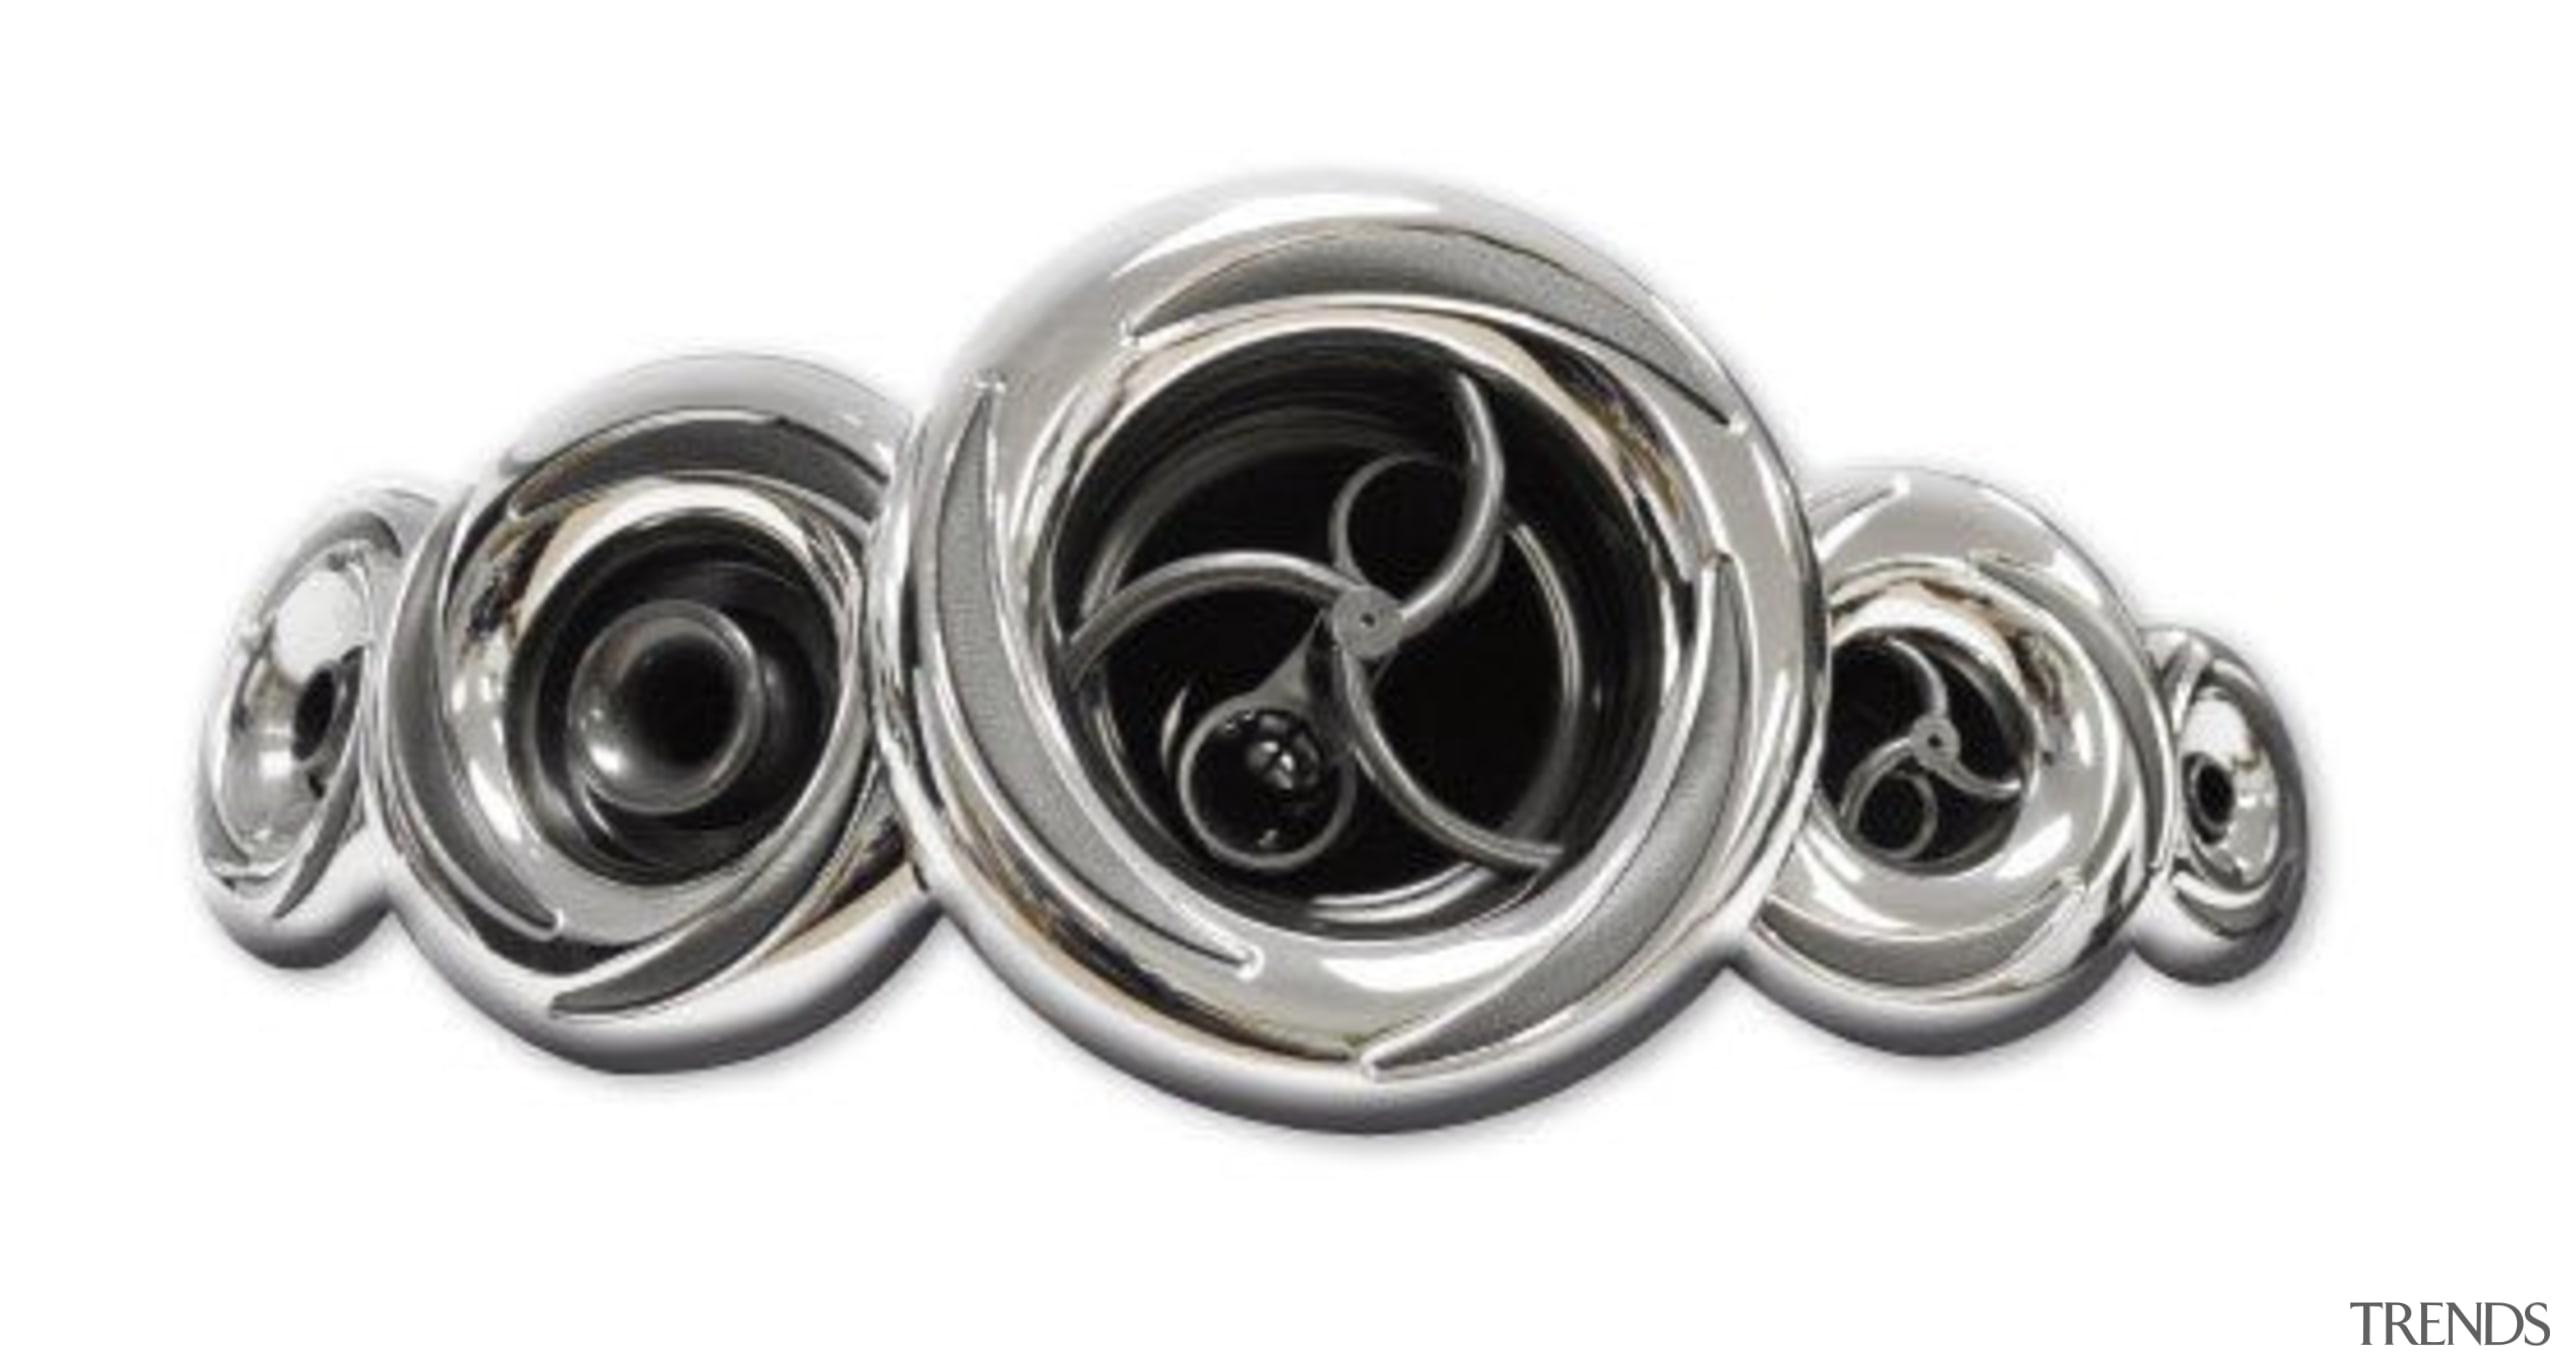 Bearingless jets - Bearingless jets - body jewelry body jewelry, hardware, metal, product, silver, wheel, white